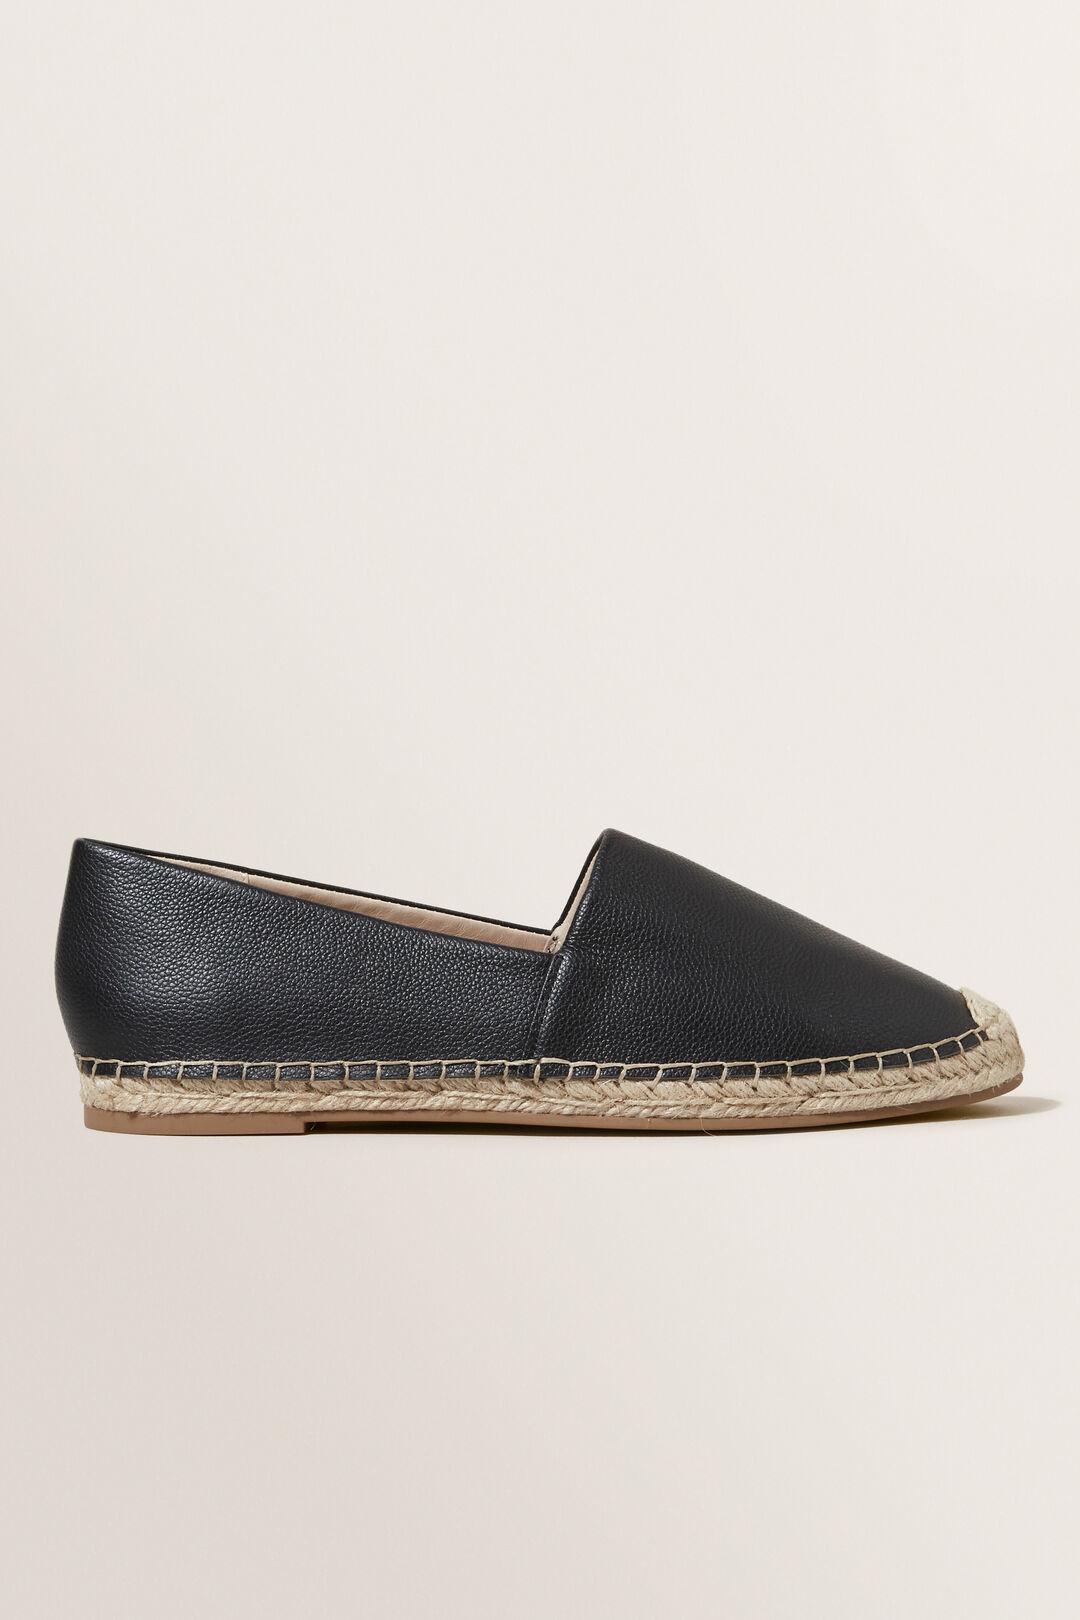 Leather Espadrille  Black  hi-res